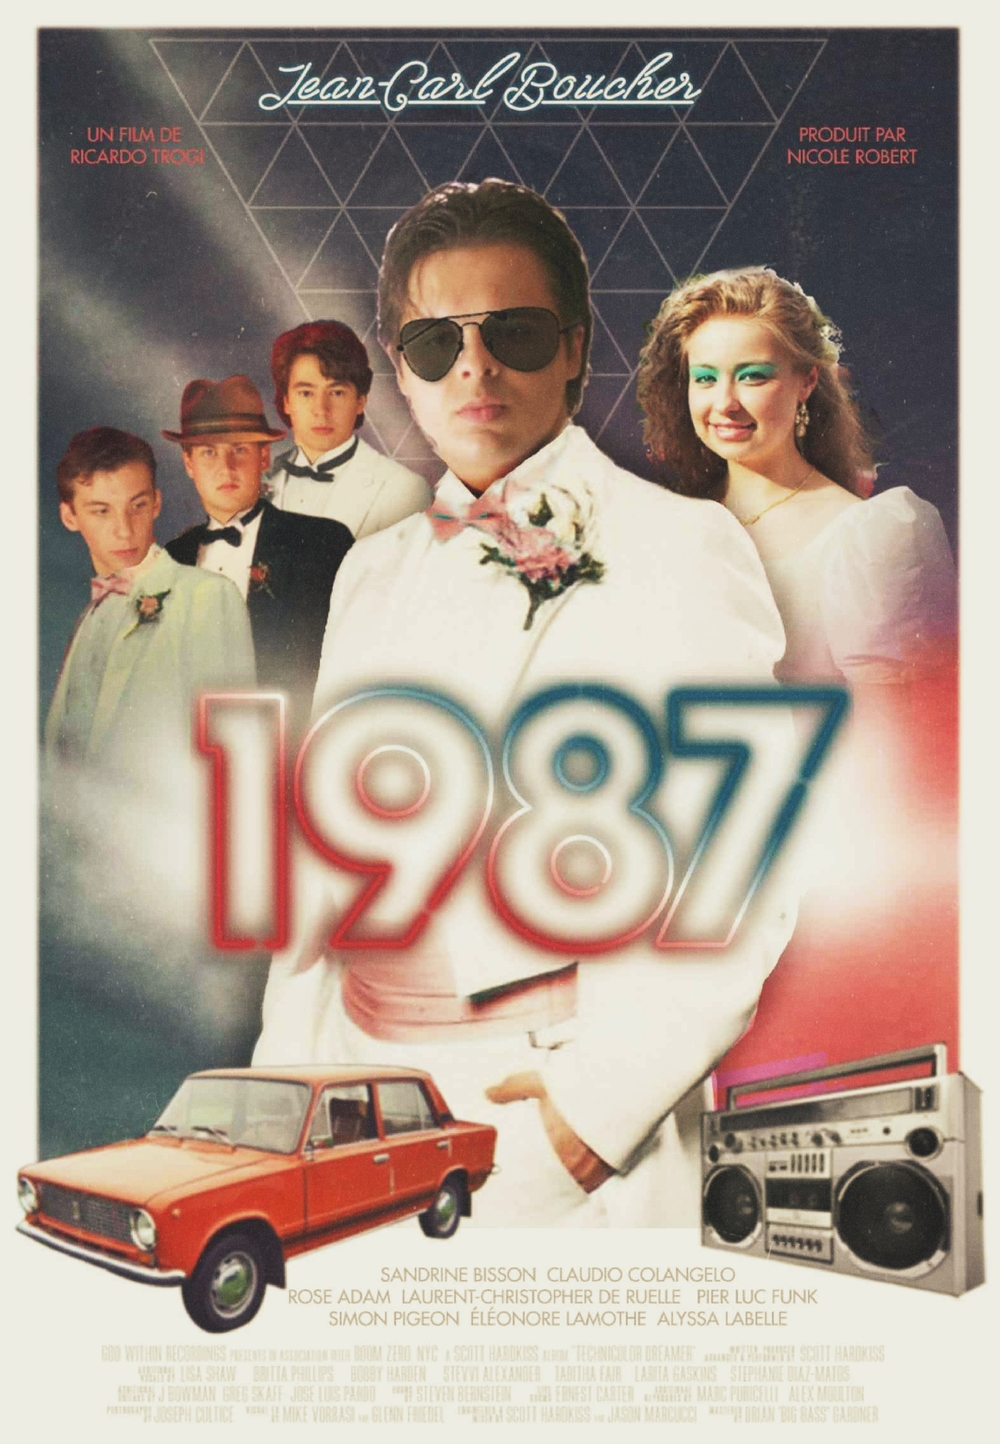 RENZO-1987-poster-concepts-31mars_00007.jpg